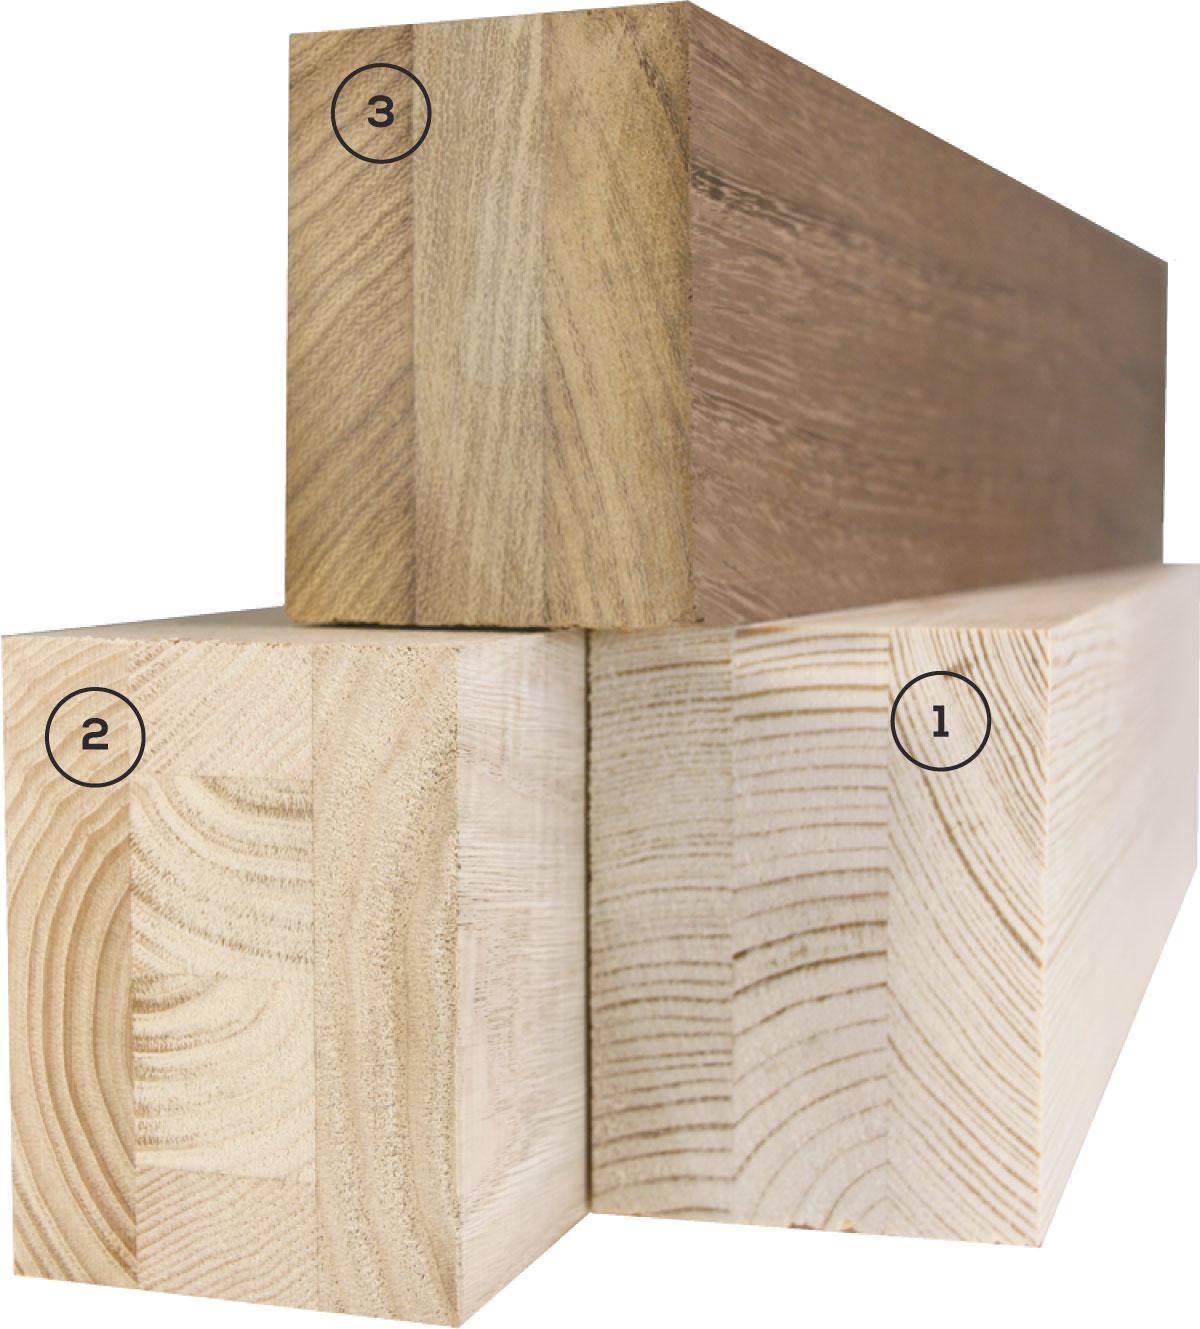 Carreté Finestres - madera de iroko, castaño o pino para la fabricación de ventanas de madera y aluminio